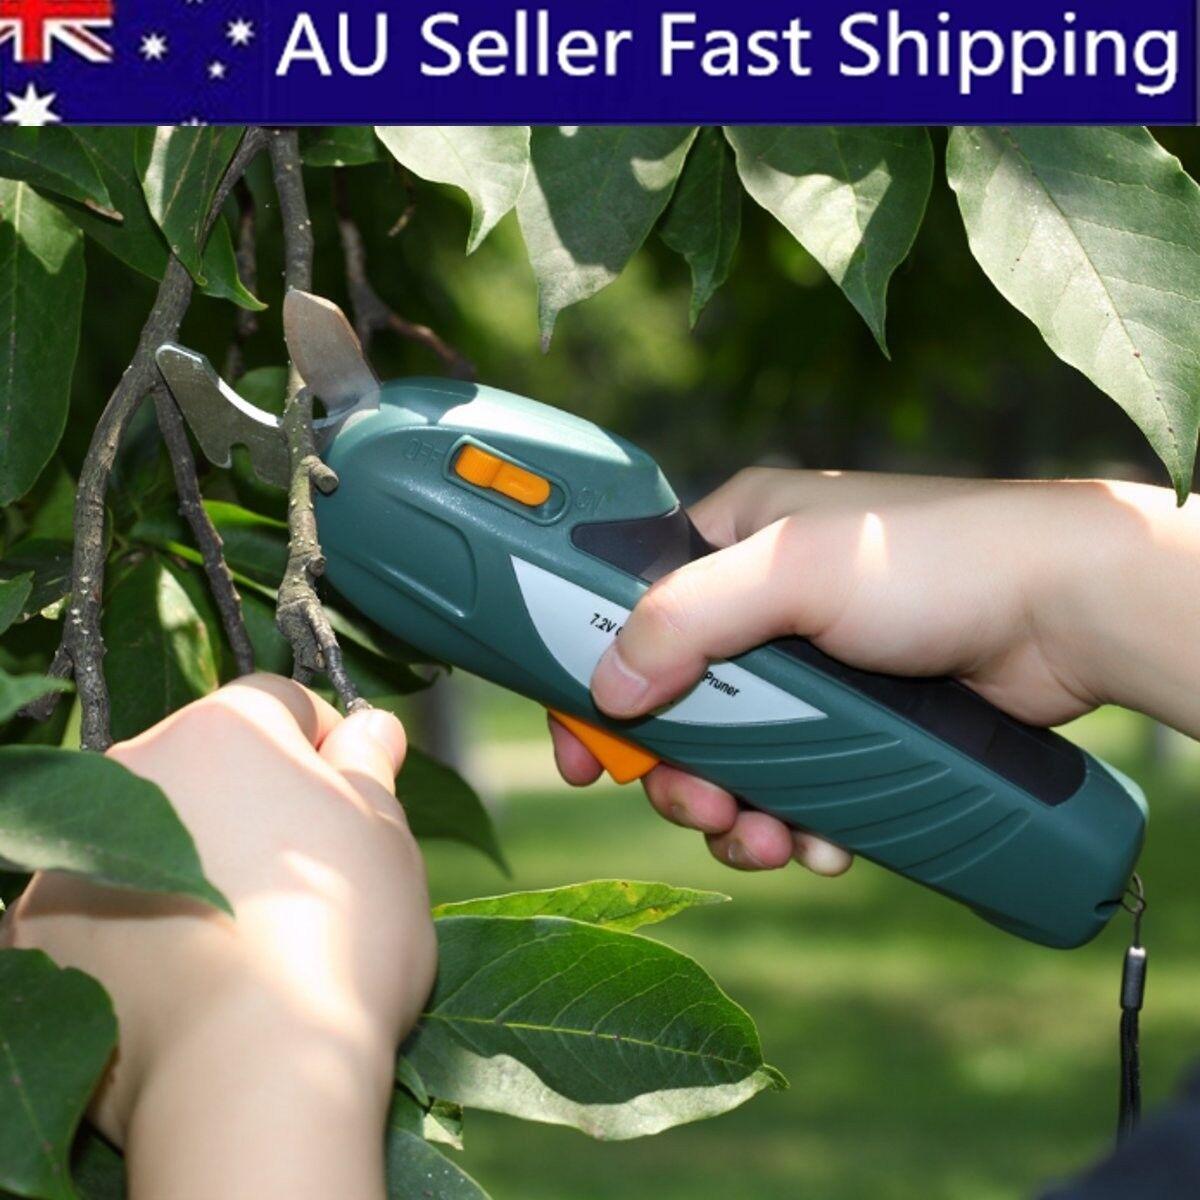 7.2V Li-ion Battery Garden Cordless Electric Pruning Shears Snips Branch Cutter